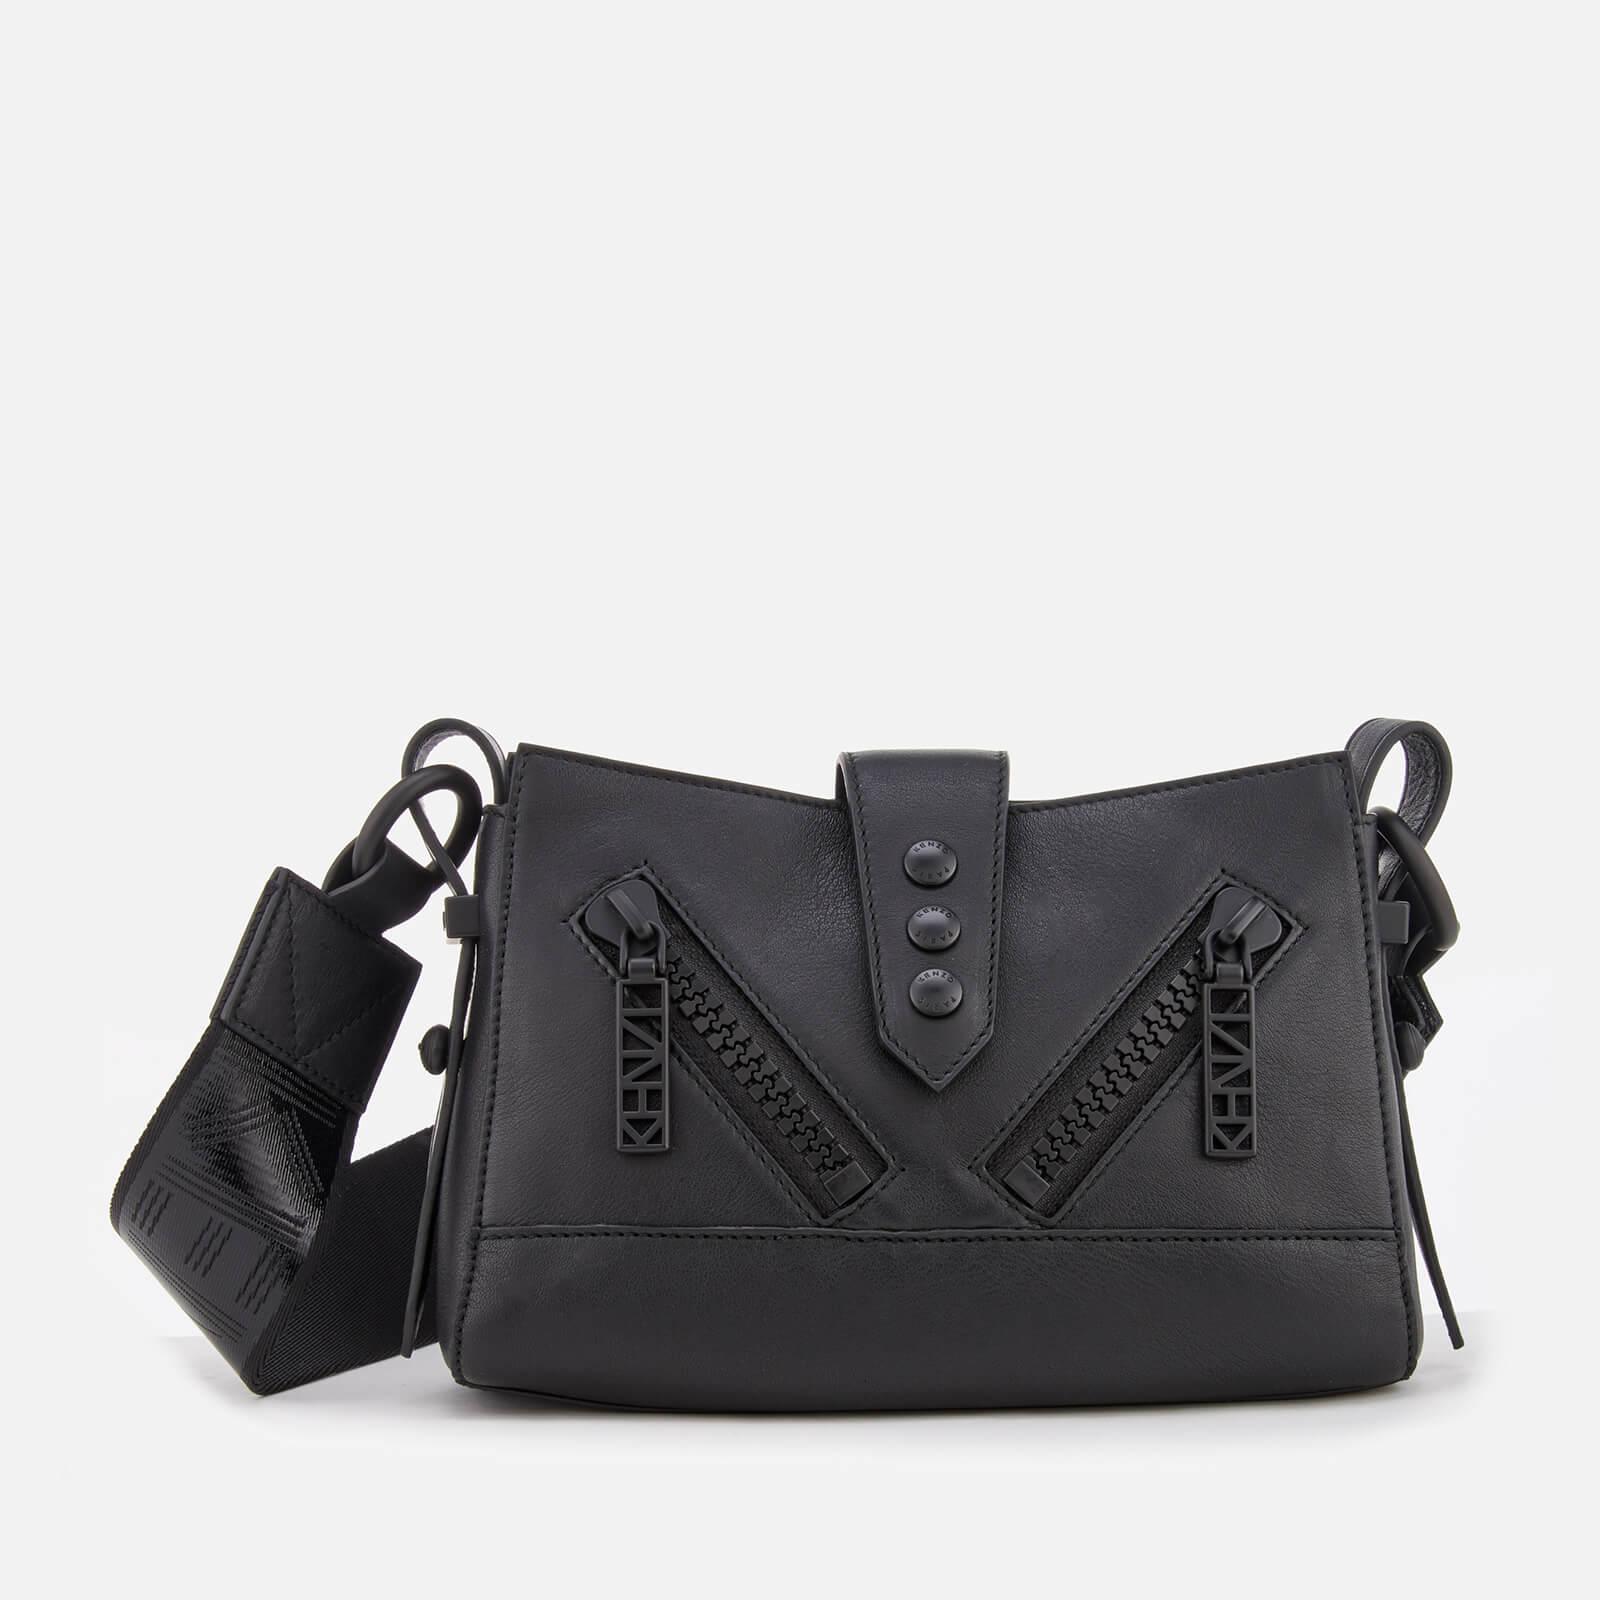 KENZO Women's Kalifornia Mini Shoulder Bag - Black